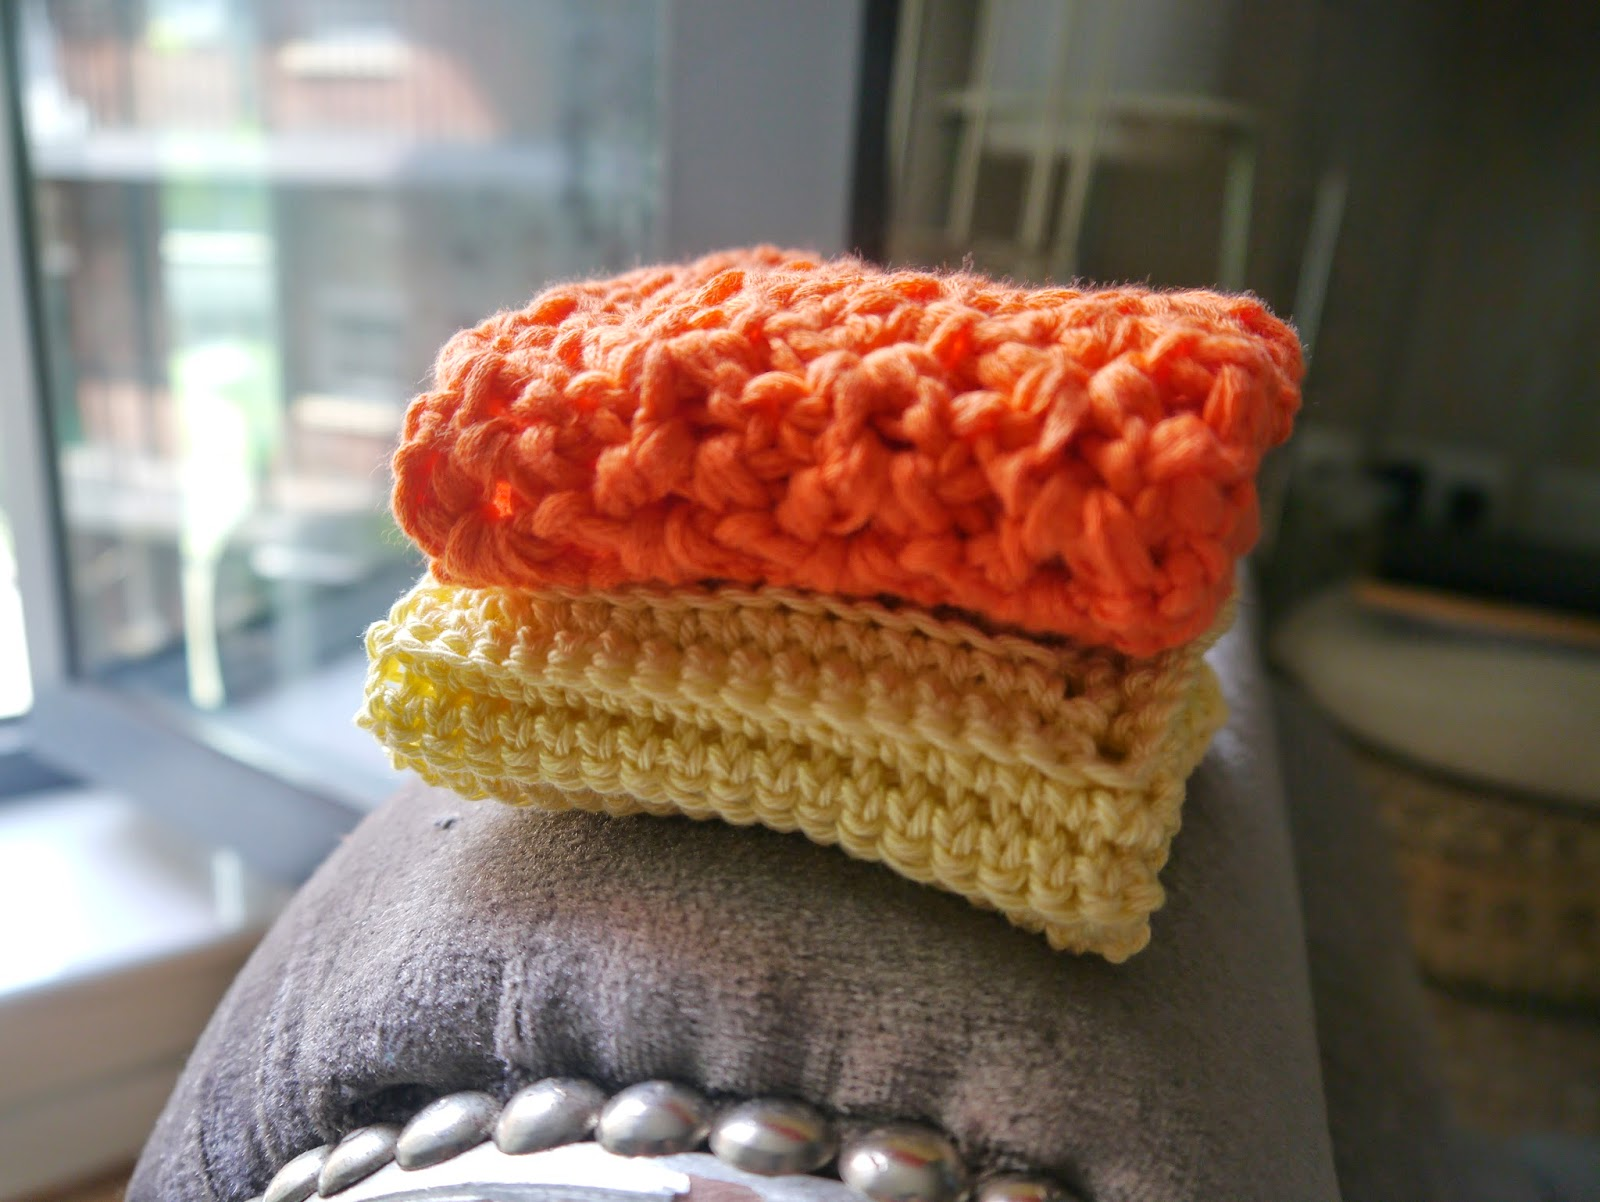 Heldasland Free Textured Crochet Dishclothwashcloth Pattern